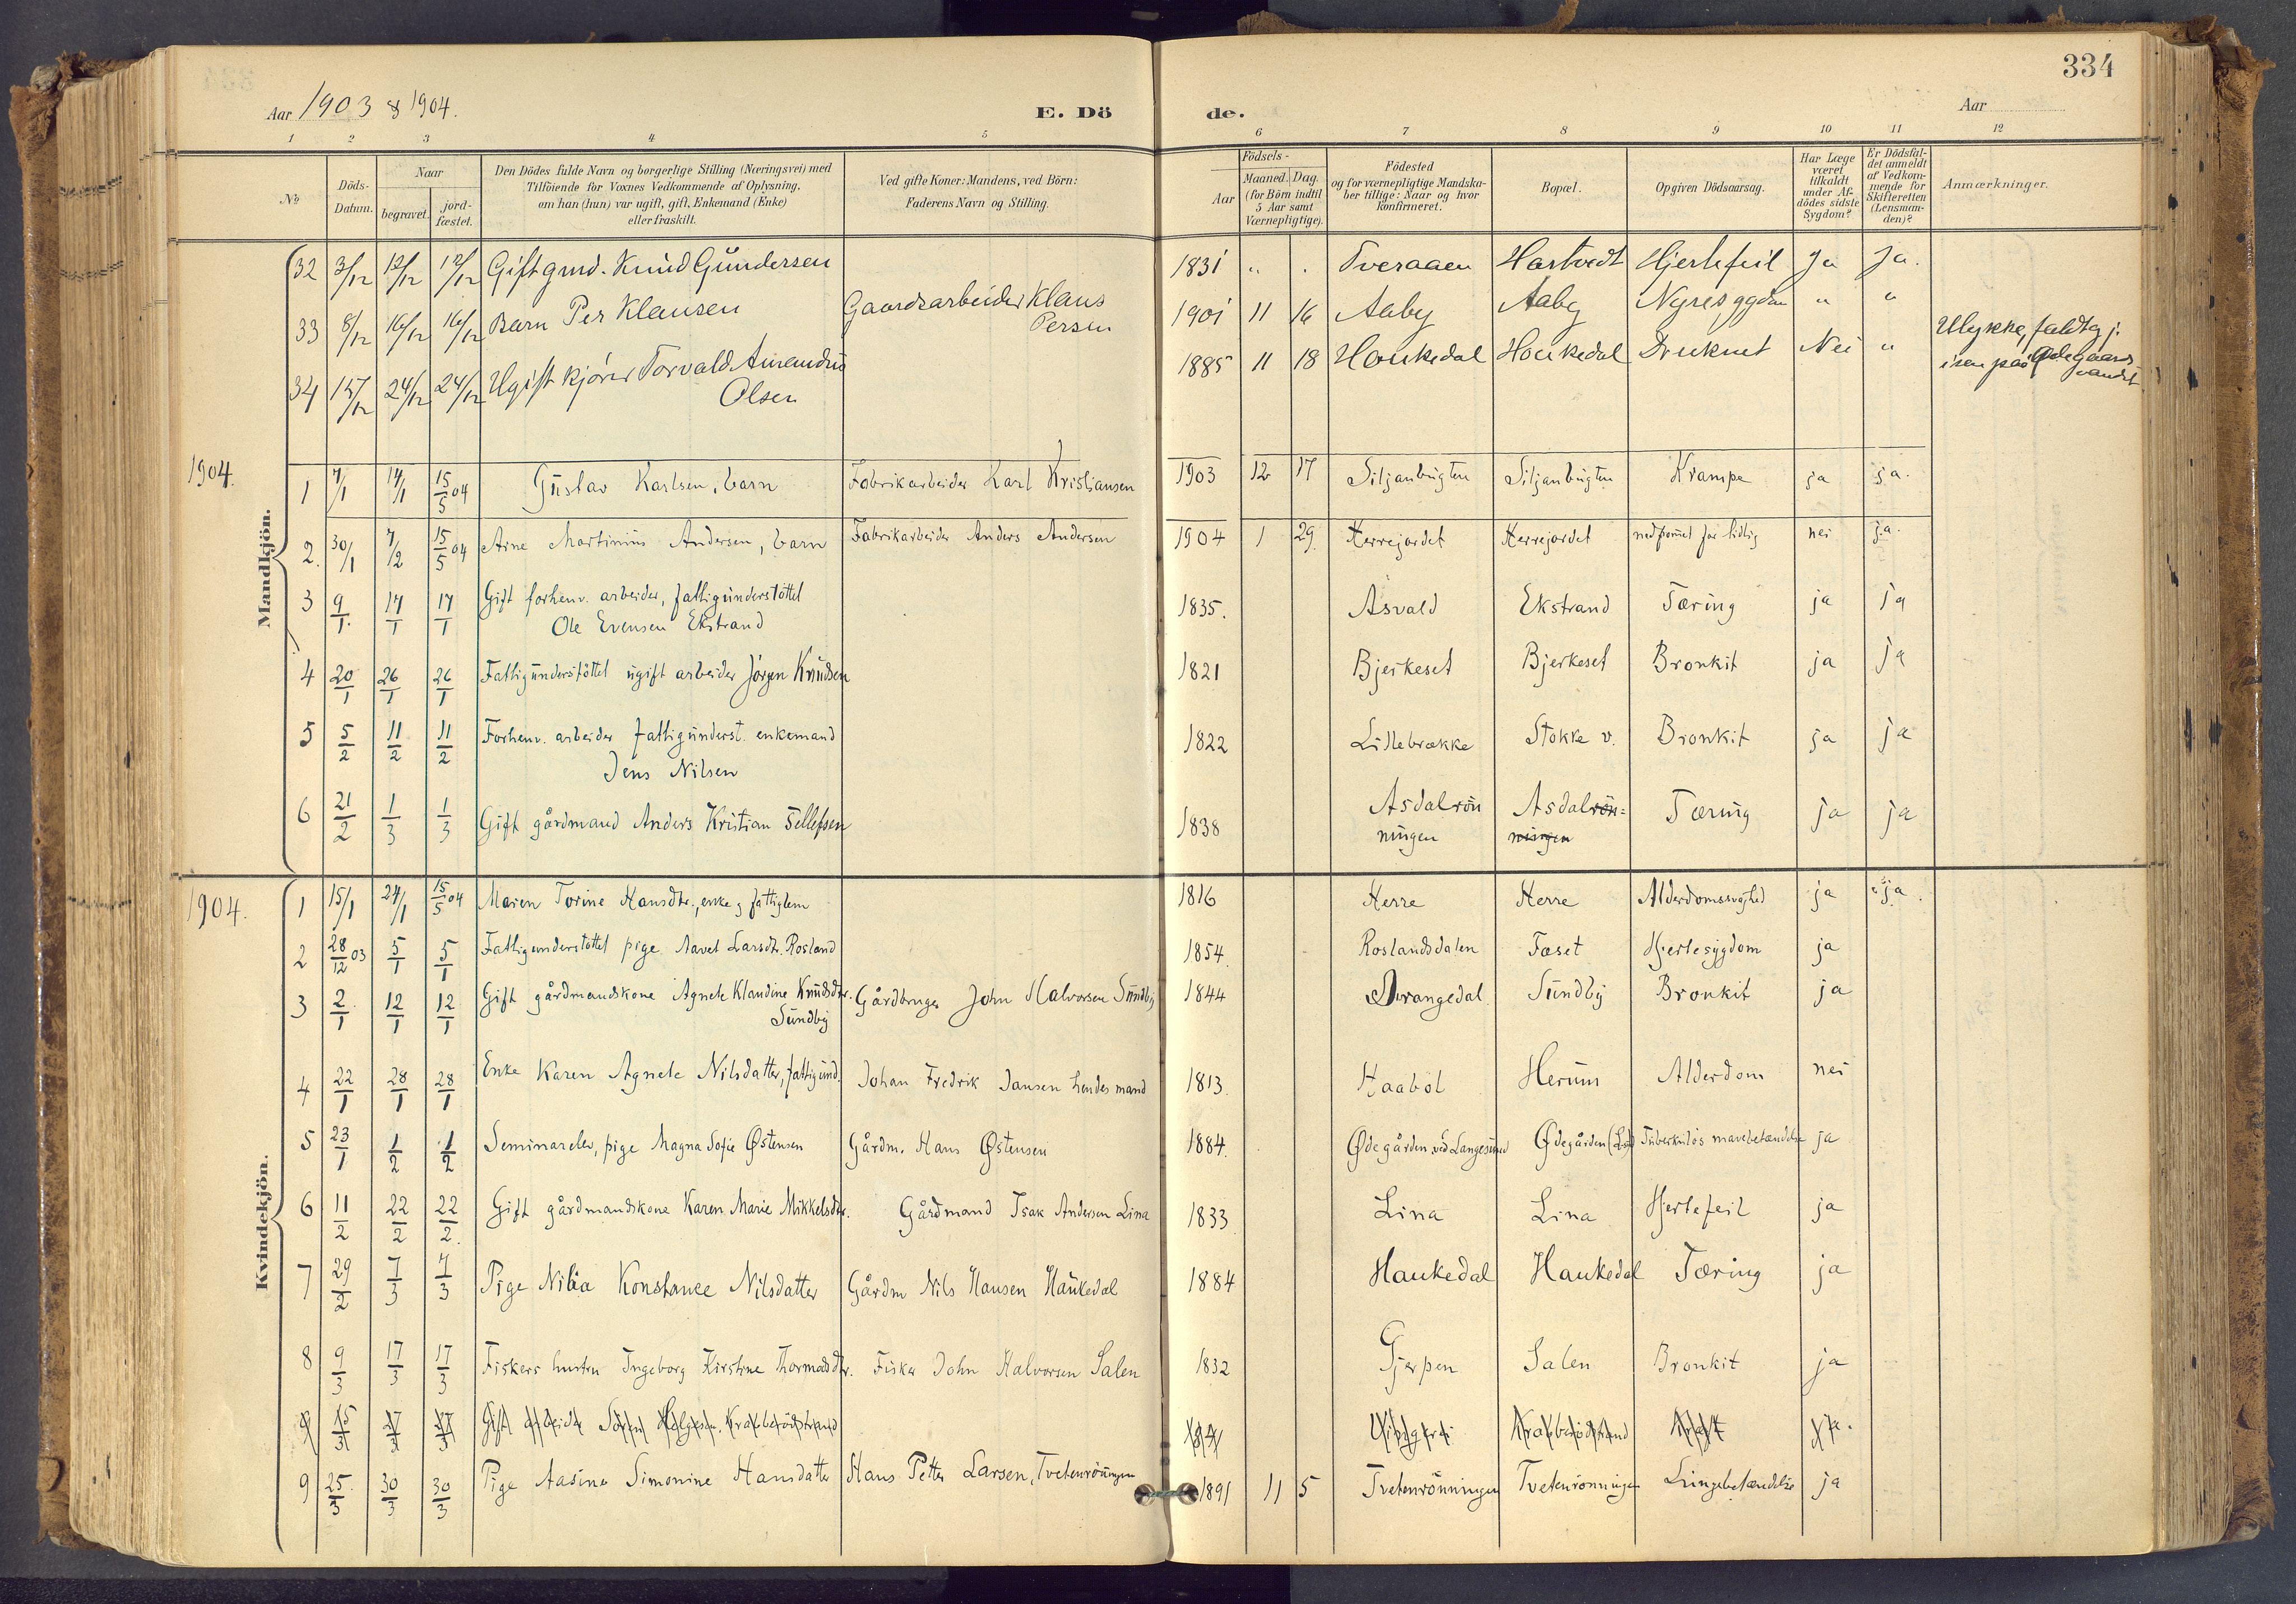 SAKO, Bamble kirkebøker, F/Fa/L0009: Ministerialbok nr. I 9, 1901-1917, s. 334